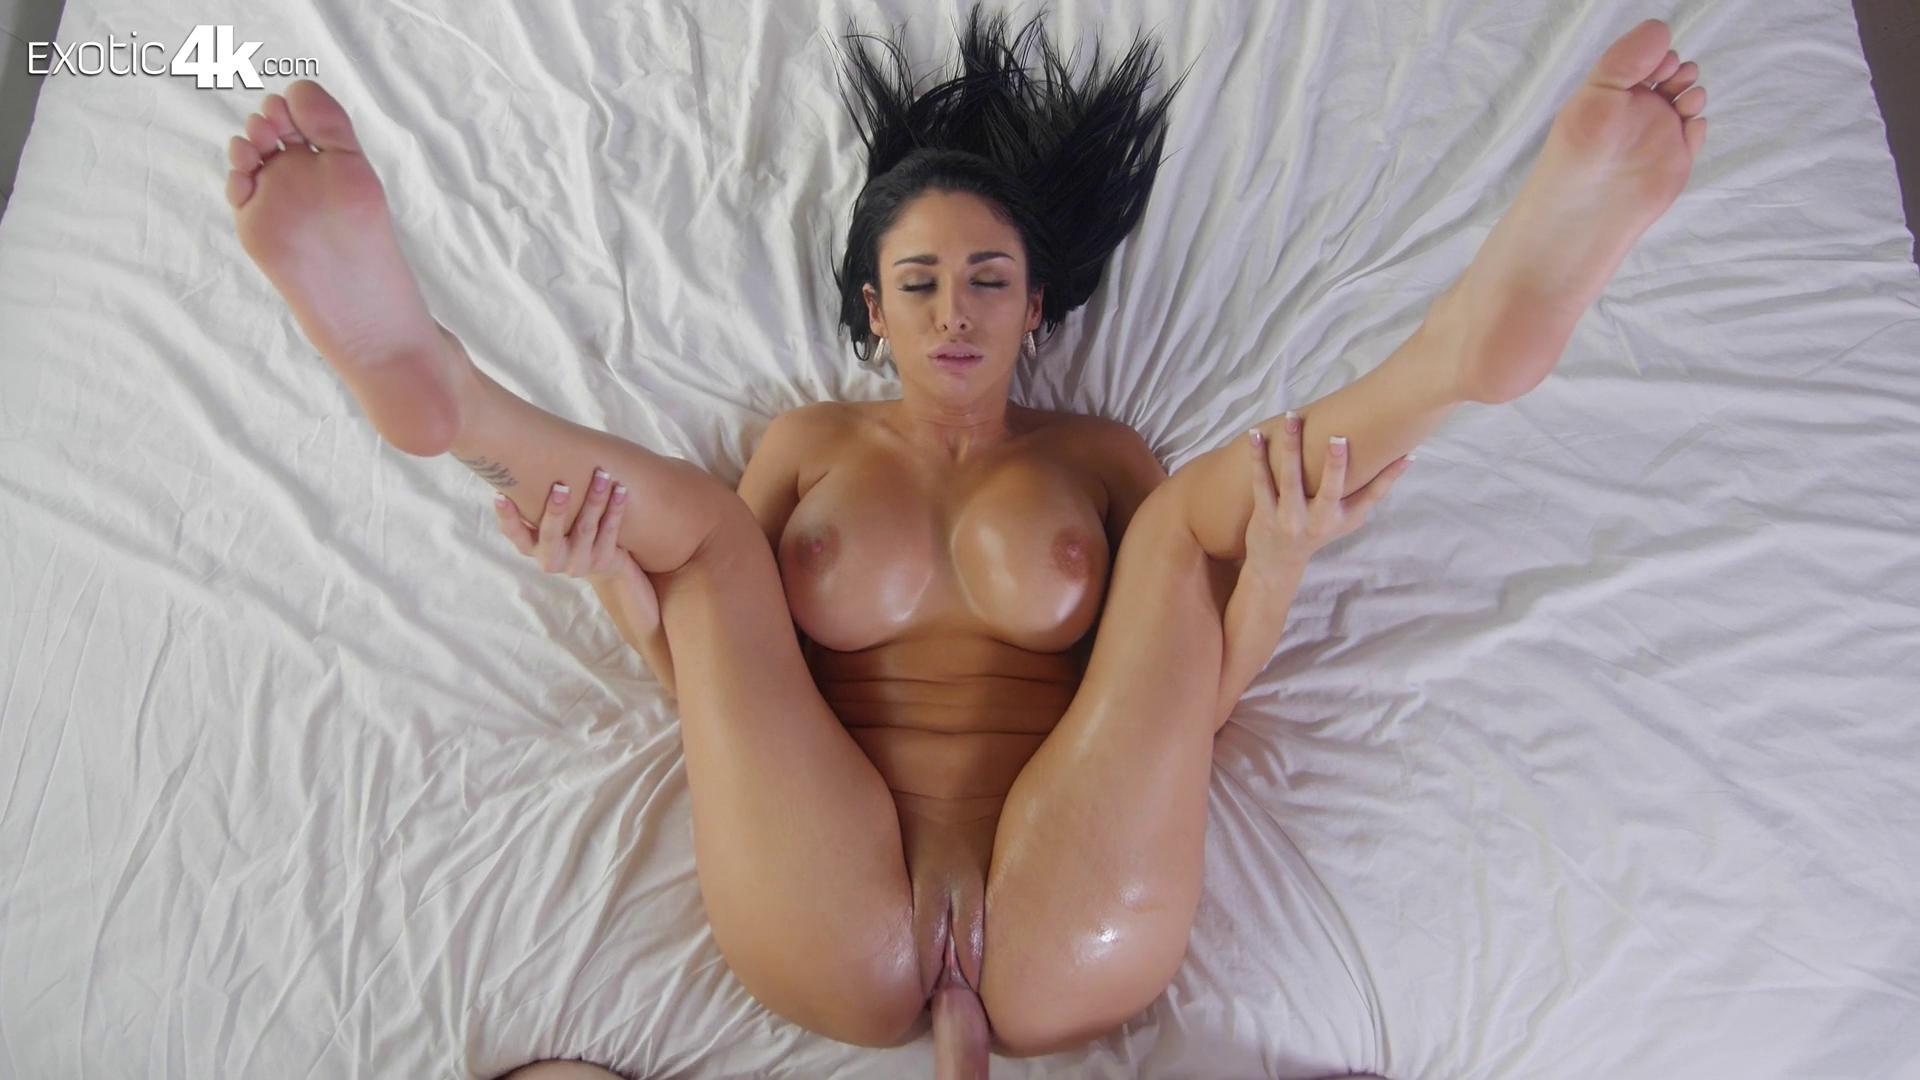 Red Head Teen Huge Tits